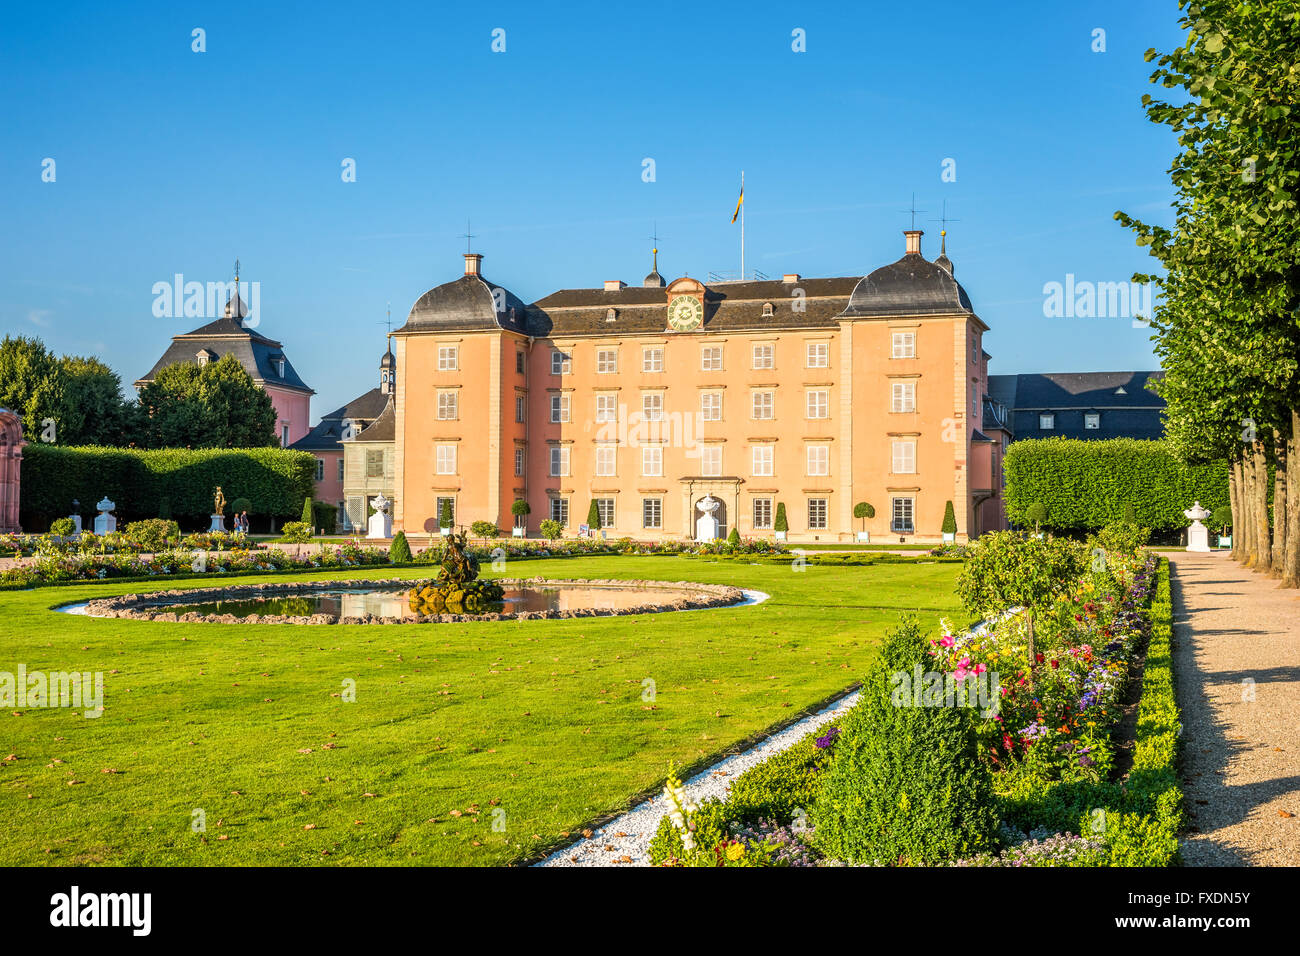 Palace, Schwetzingen, Baden-Wuerttemberg, Germany - Stock Image